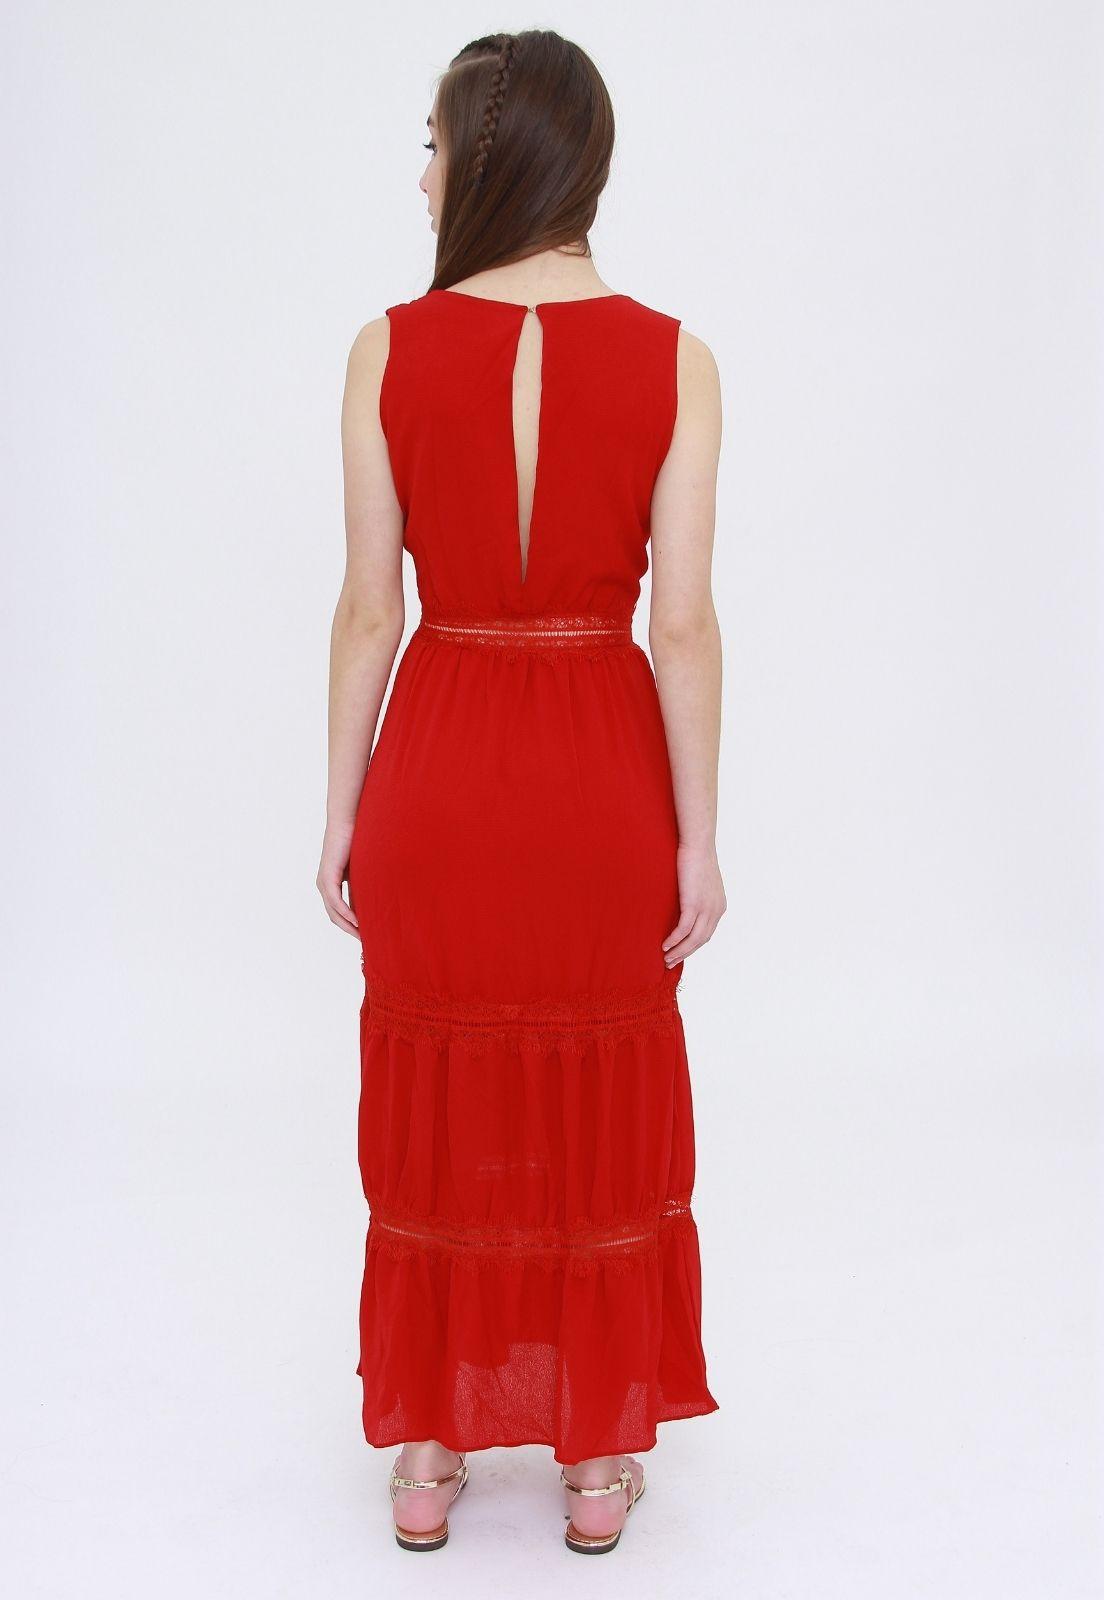 Vestido Longo Trabuca Vermelho  - Metro & Co.